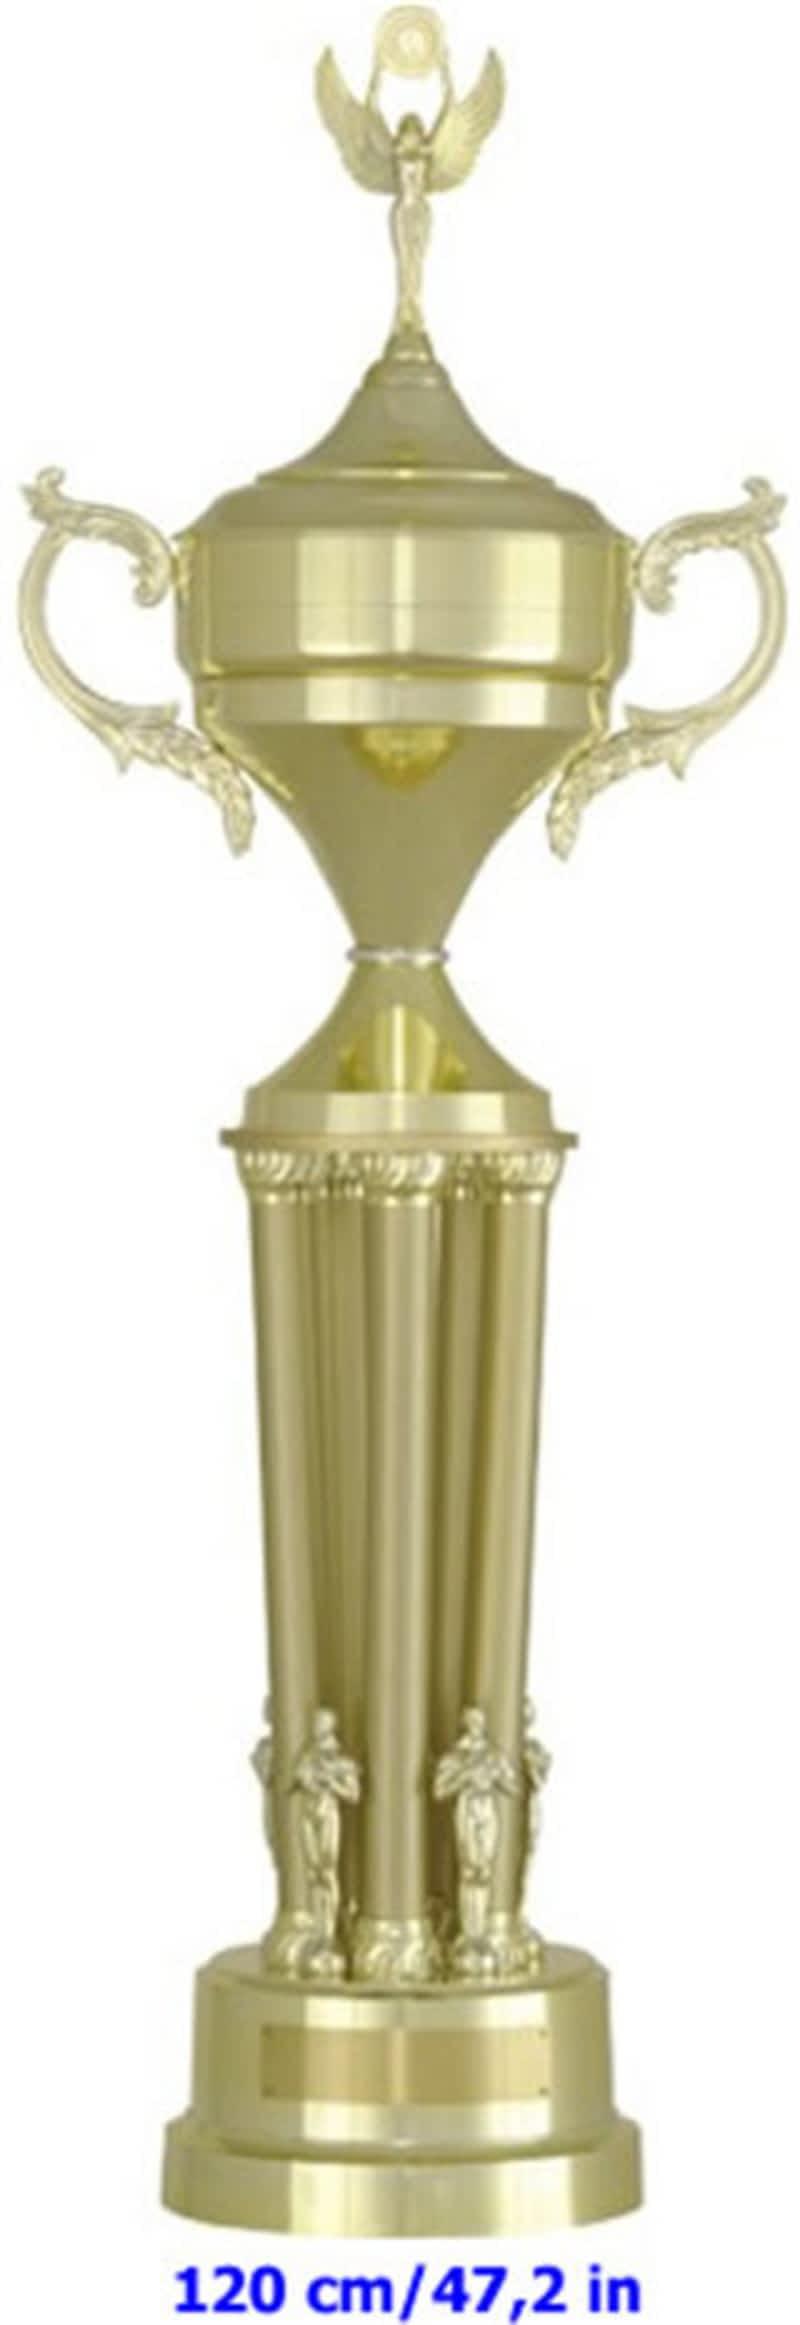 Superstar Awards Amp Recognition Surrey Bc 13122 62b